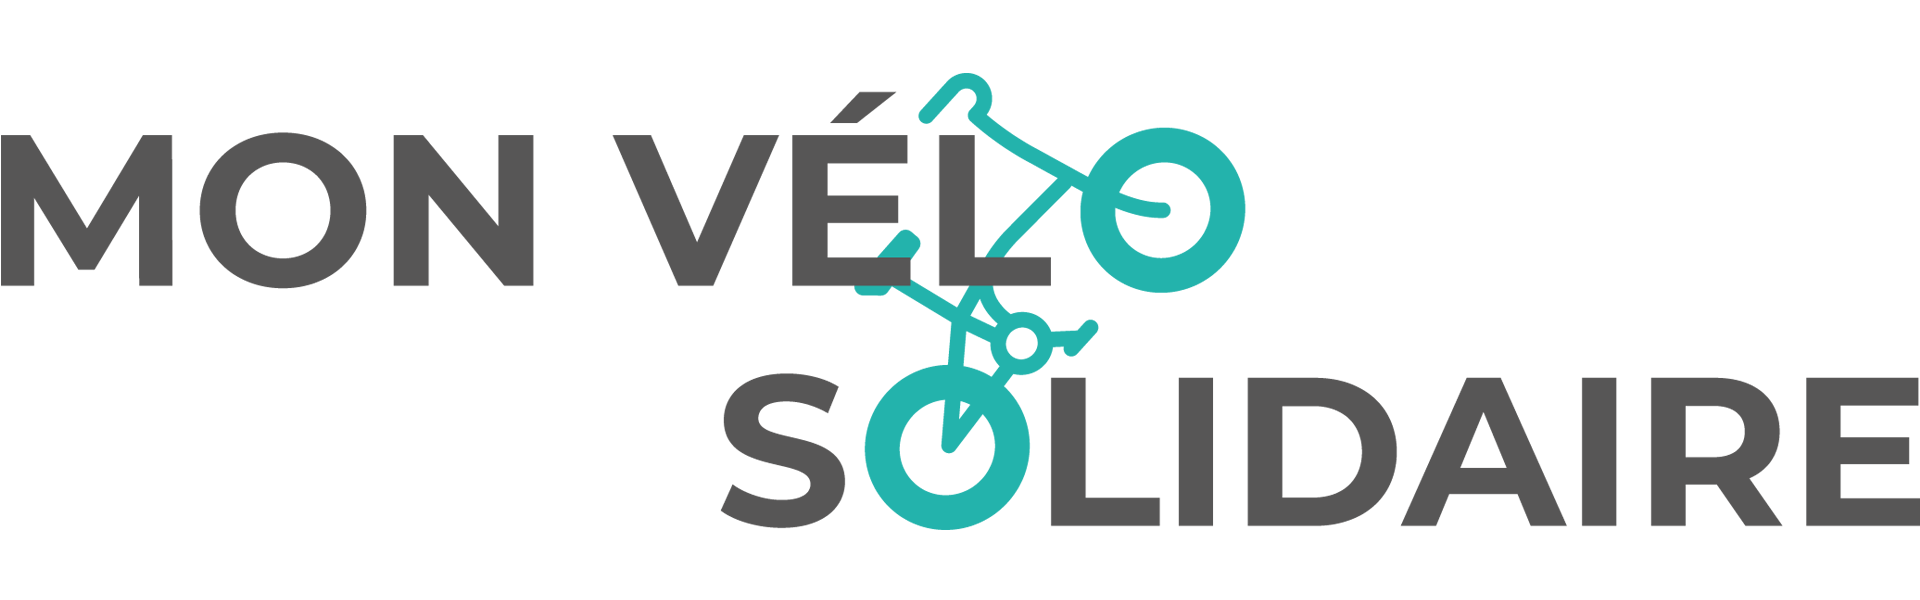 Maison_Velo_Lyon_mon-velo-solidaire_slider